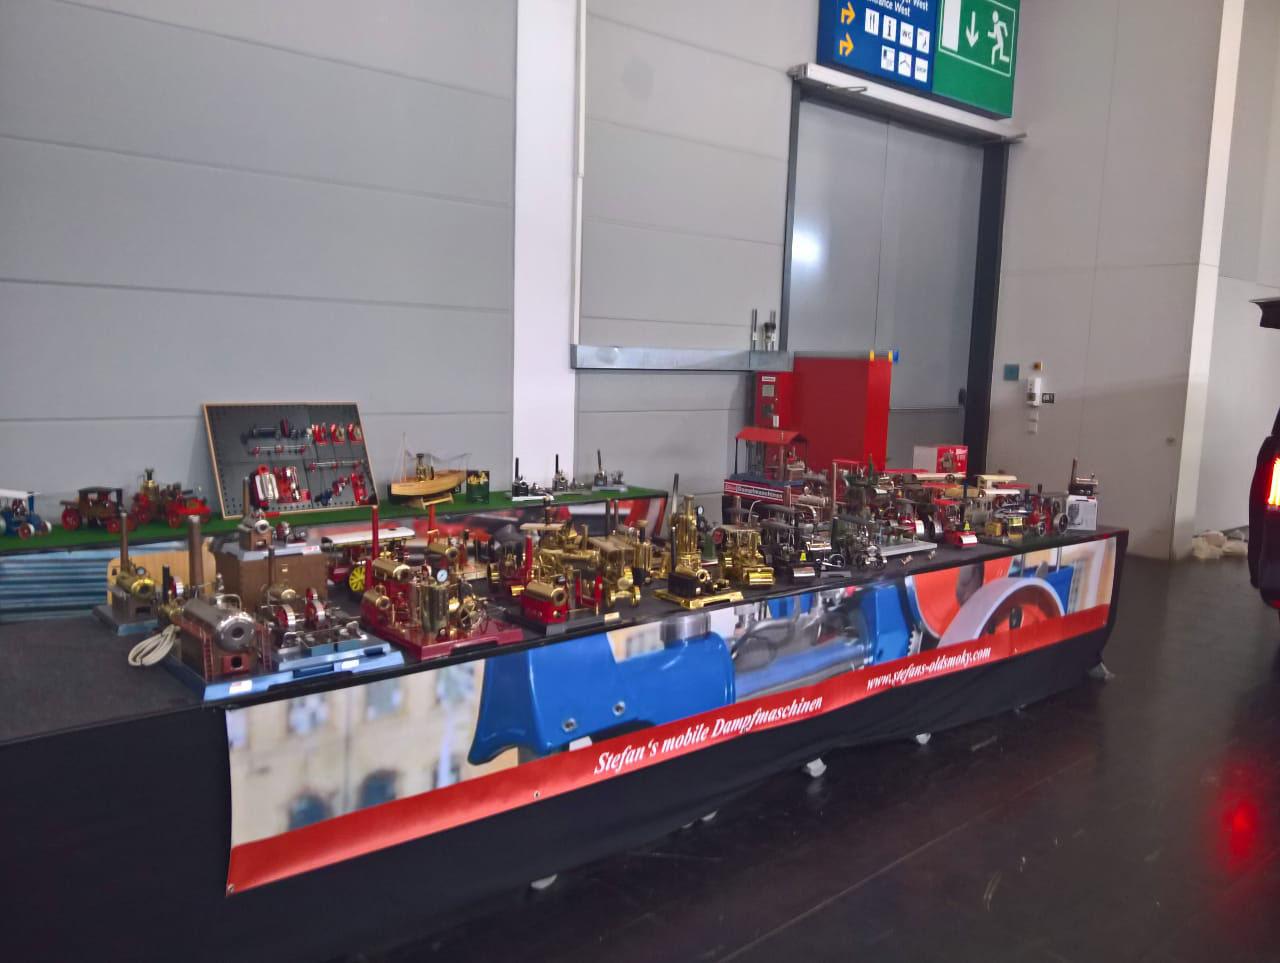 faszination modellbau - stefans-oldsmoky